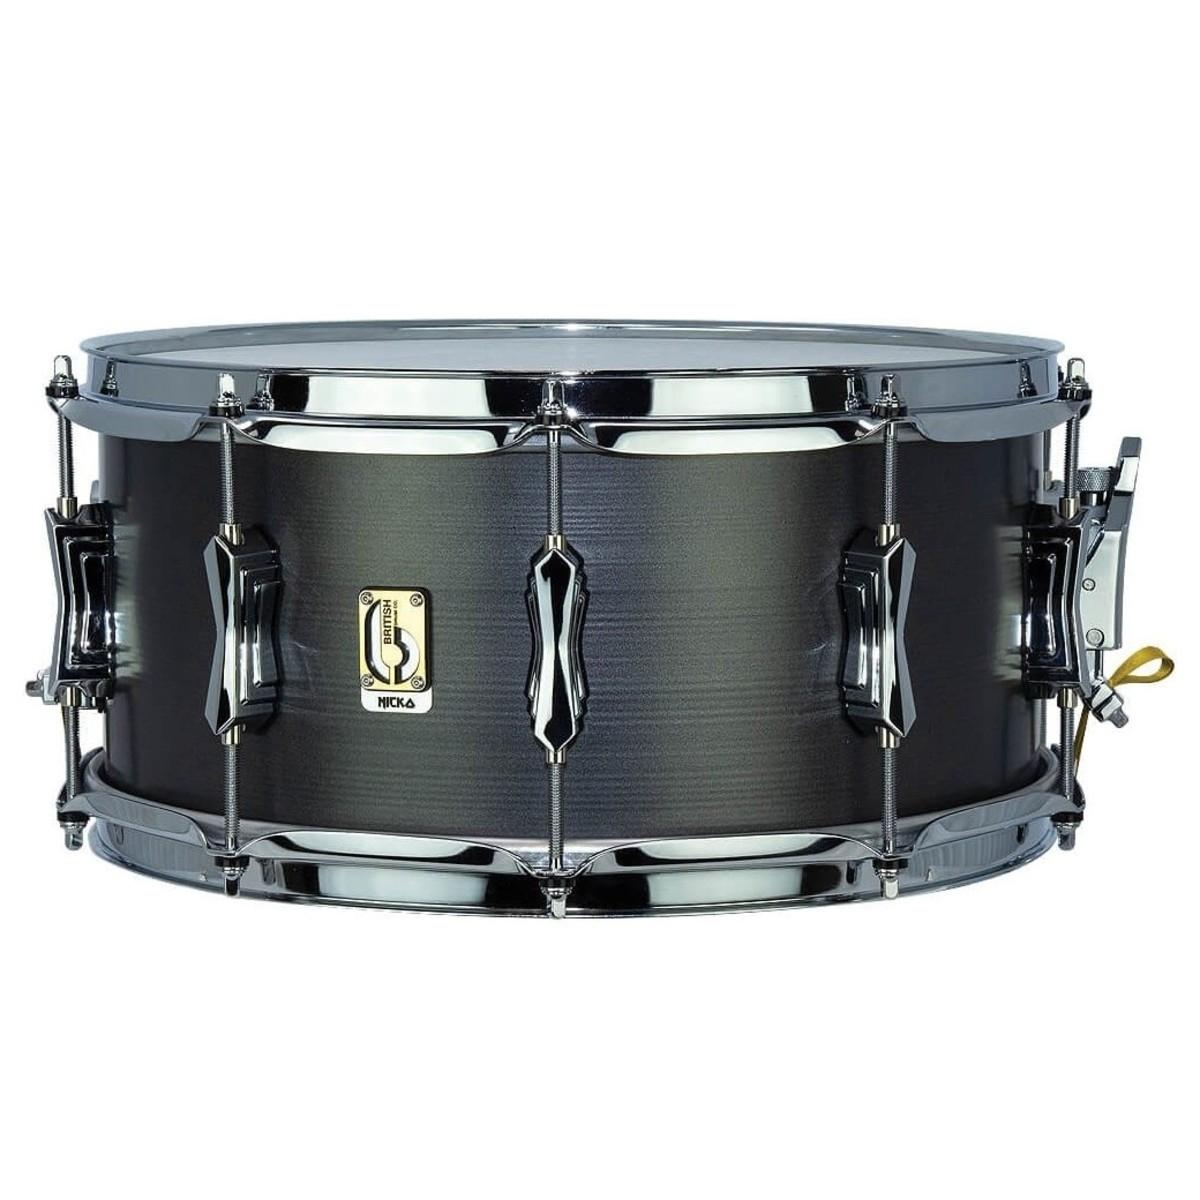 British Drum Company Talisman